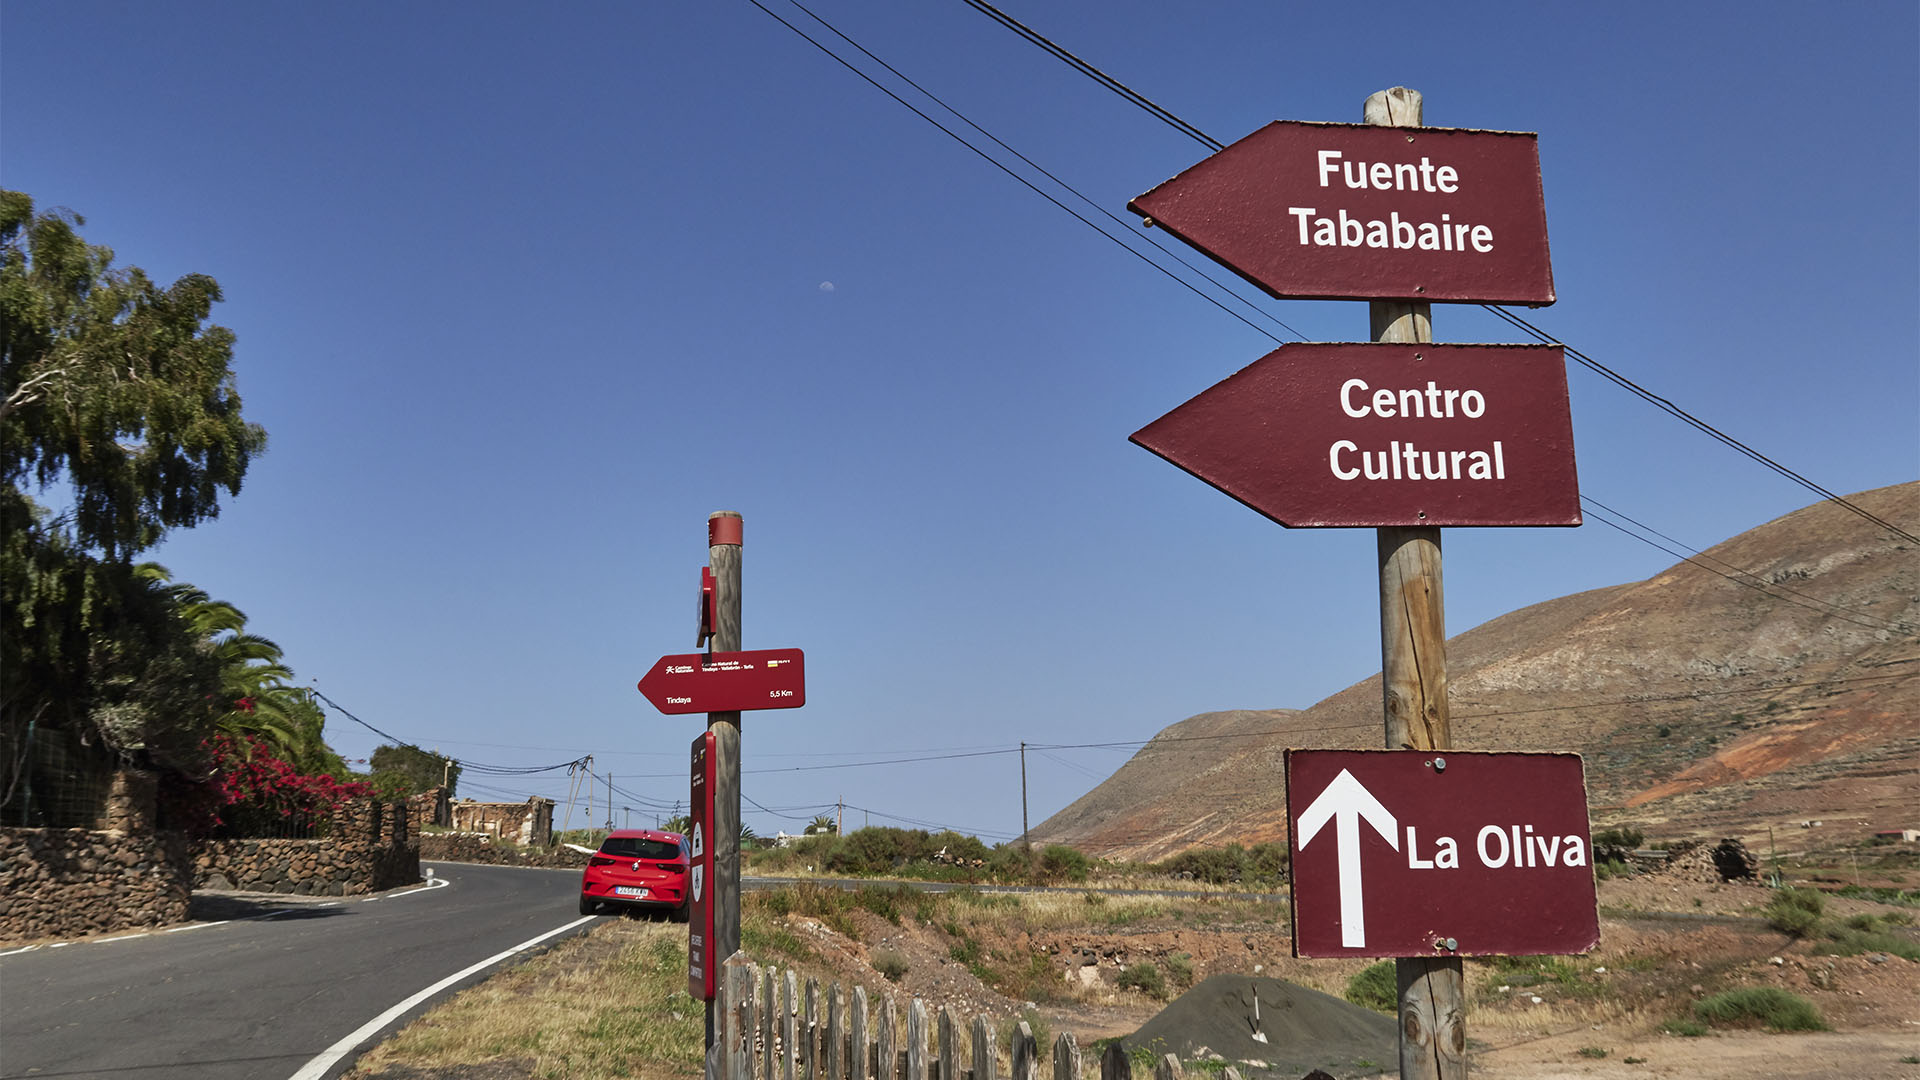 Abzweig zur Fuente de Tababaire Vallebrón Fuerteventura.